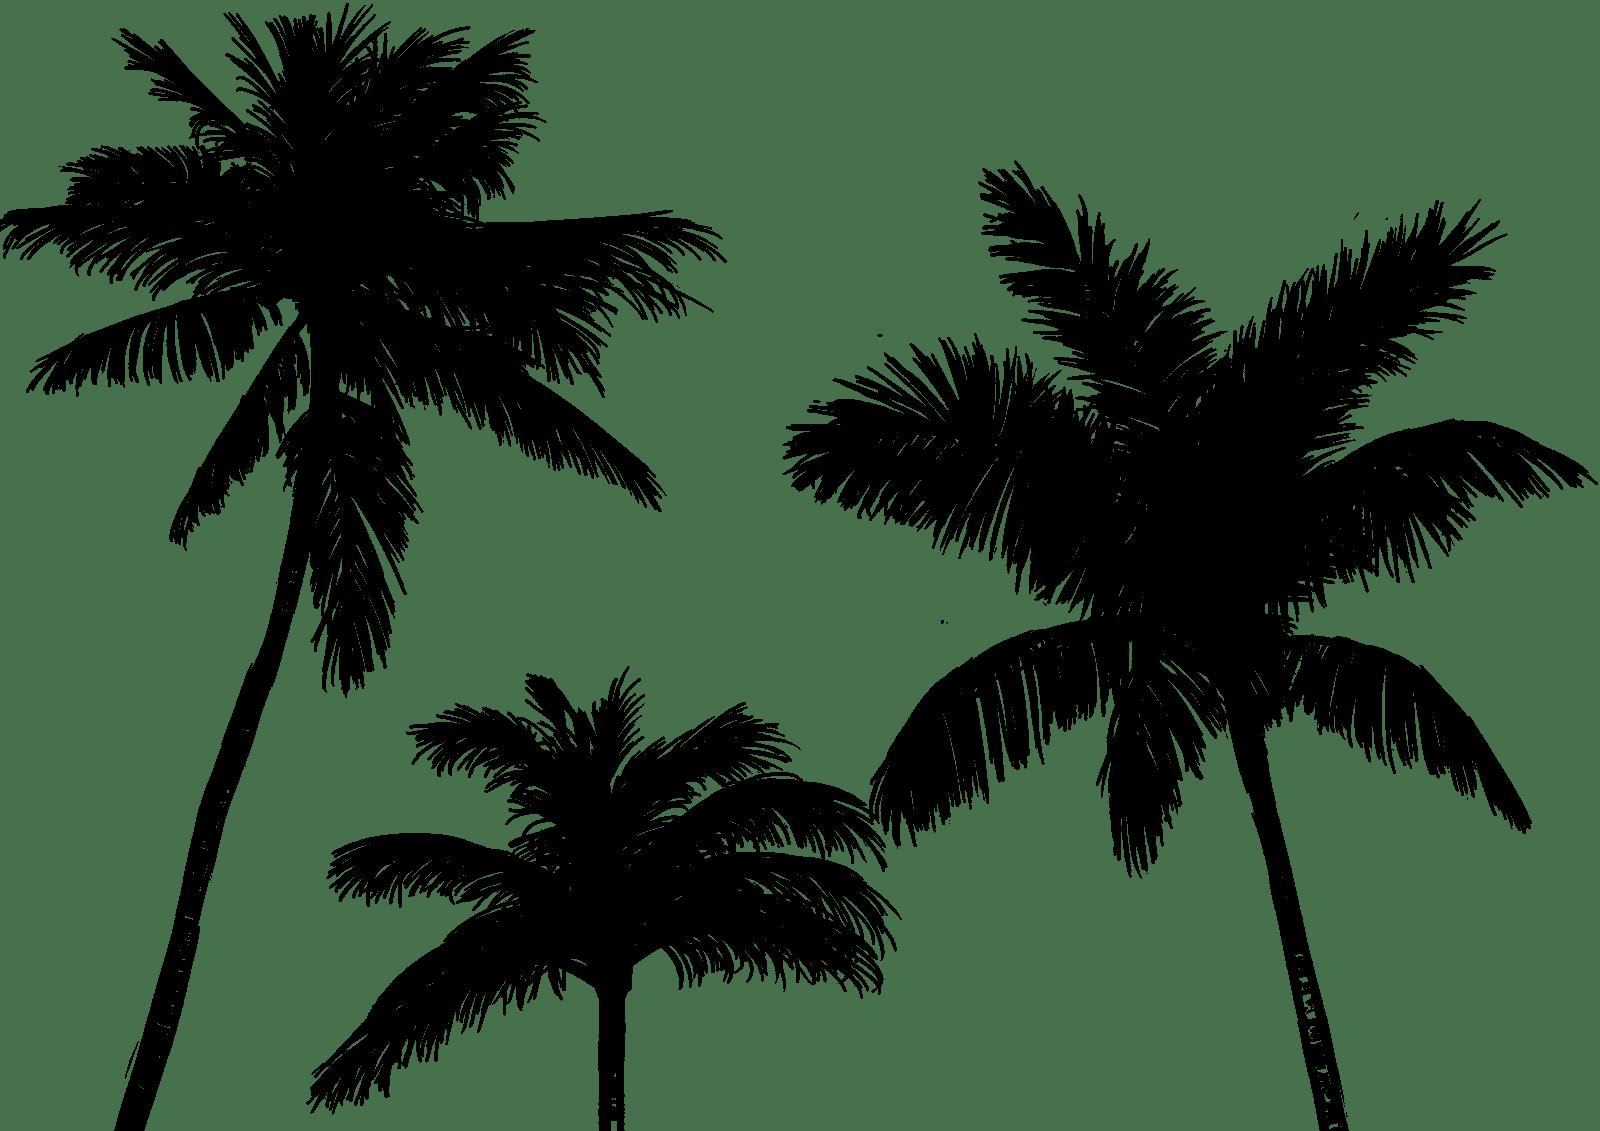 Sketch palm trees